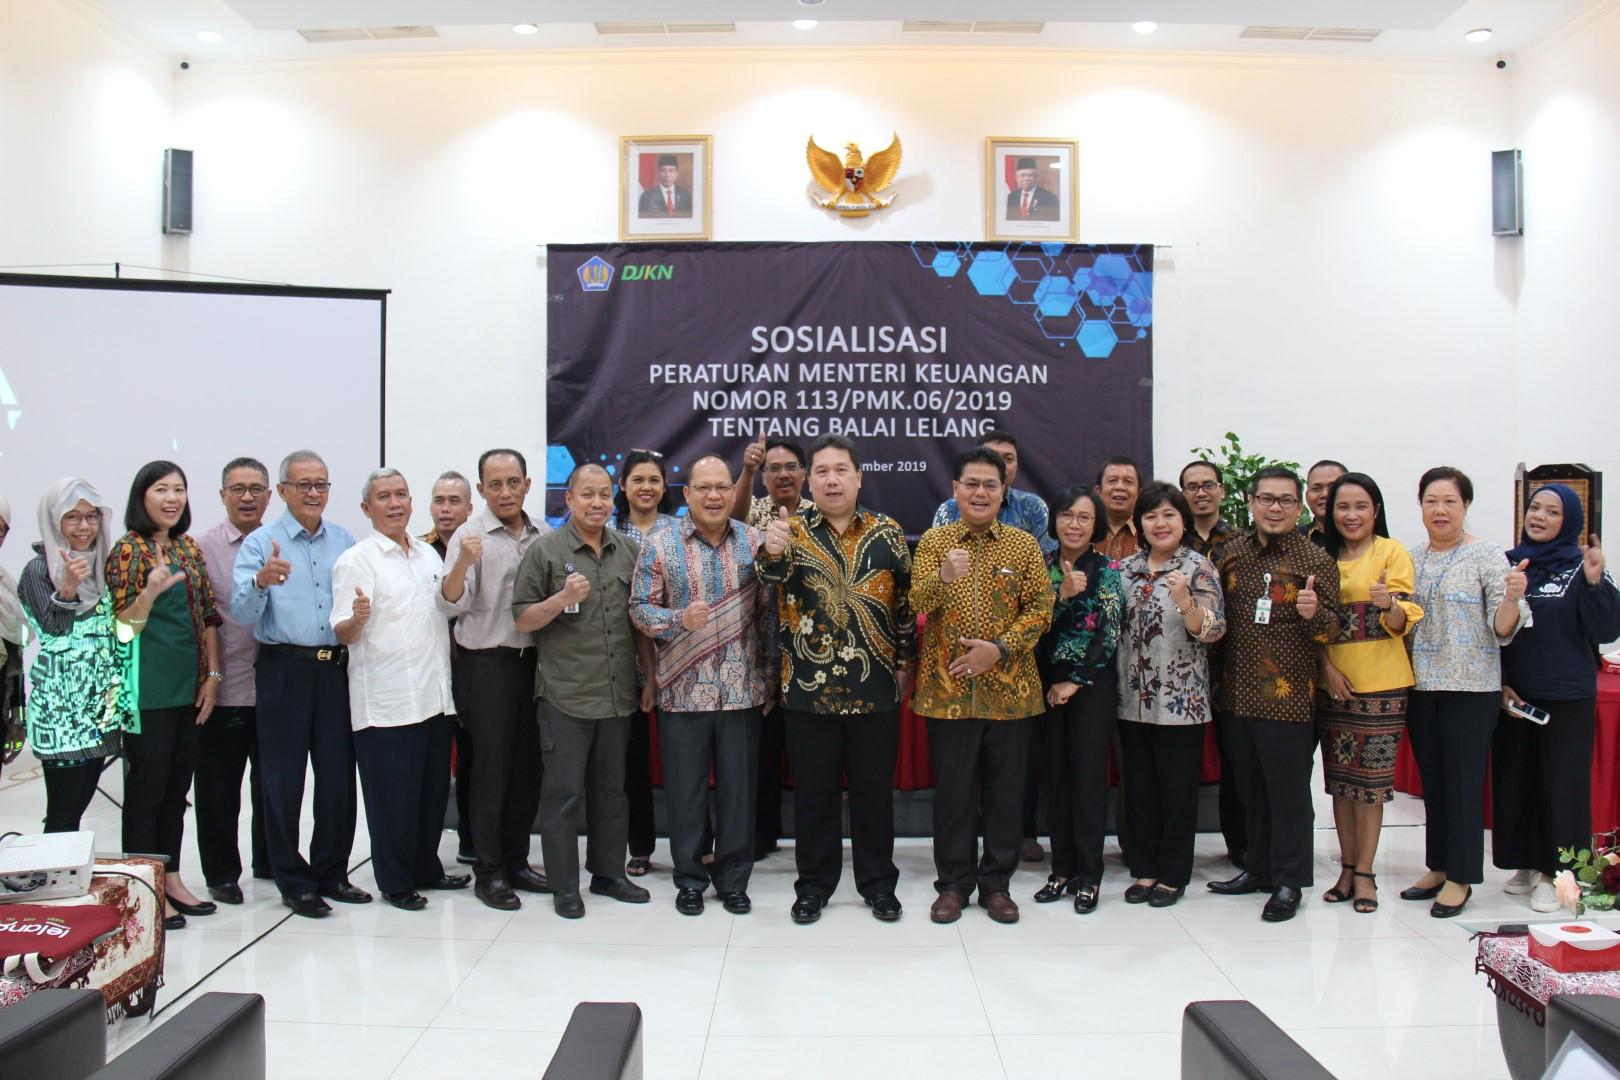 Simplifikasi Perizinan Balai Lelang easy-entry easy-exit strong-supervision PMK – 113/PMK.06/2019 tentang Balai Lelang